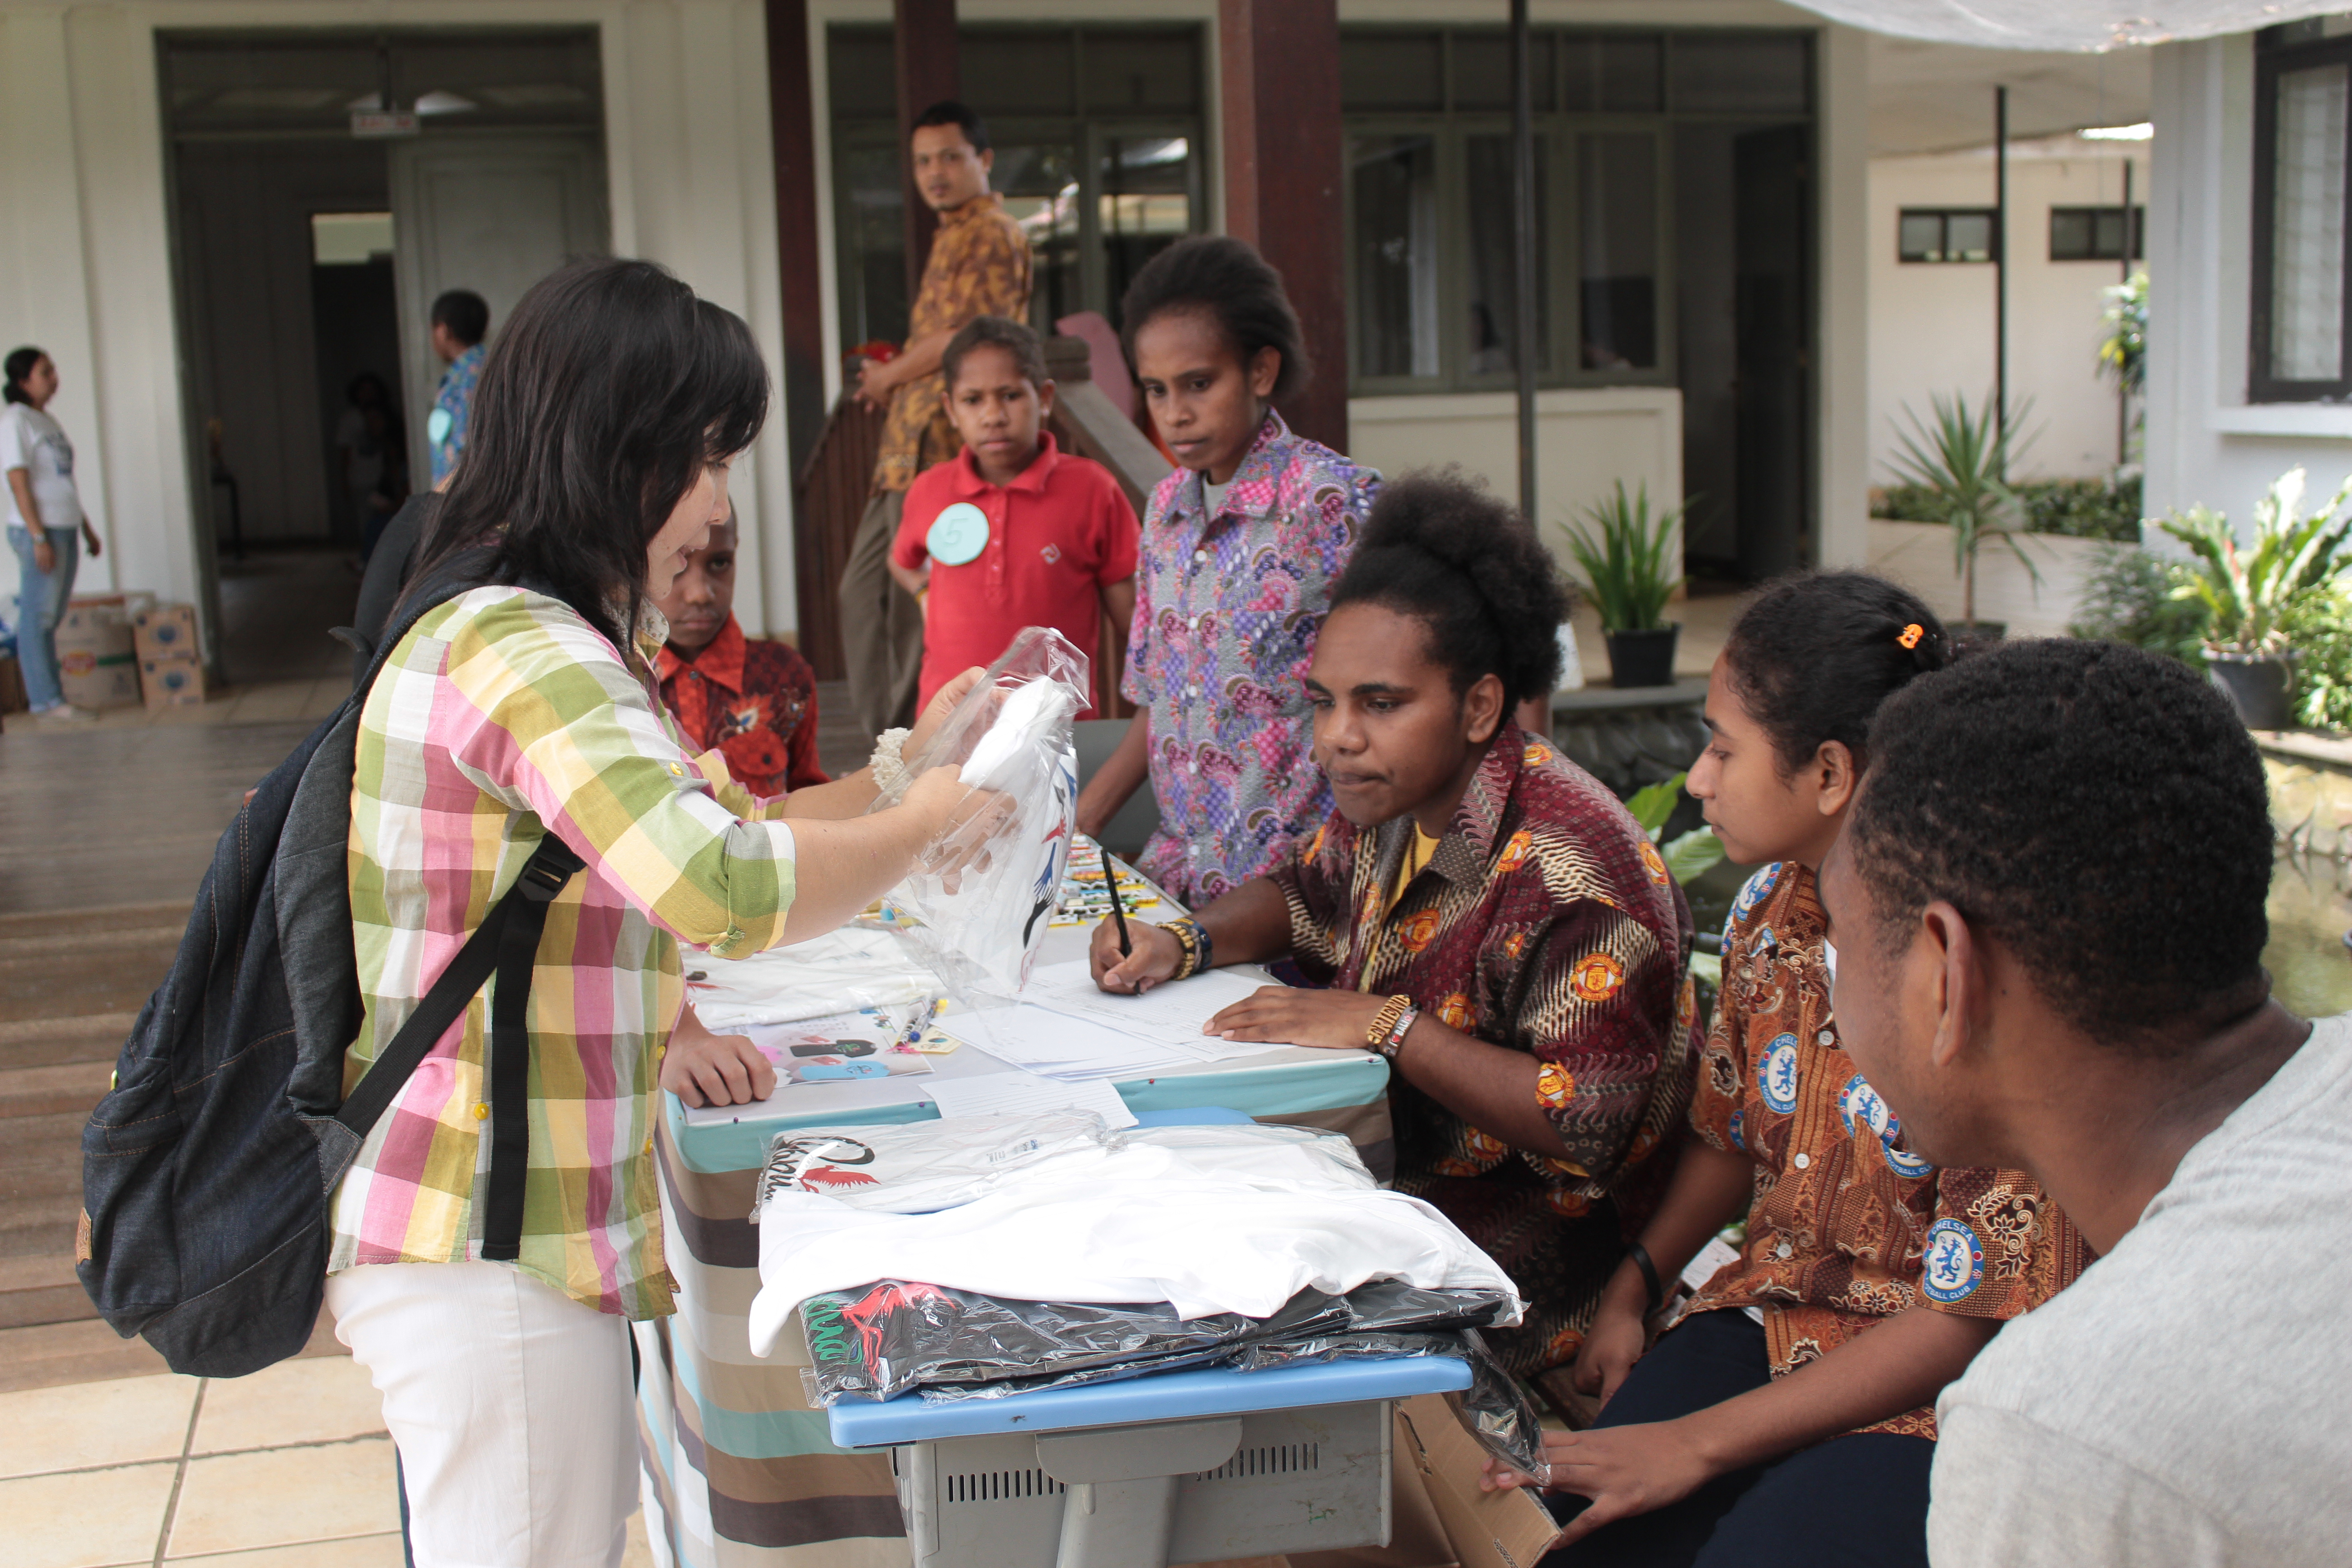 sekolah anak indoensia-sekolah Papua-lomba mewarnai-bazar open house